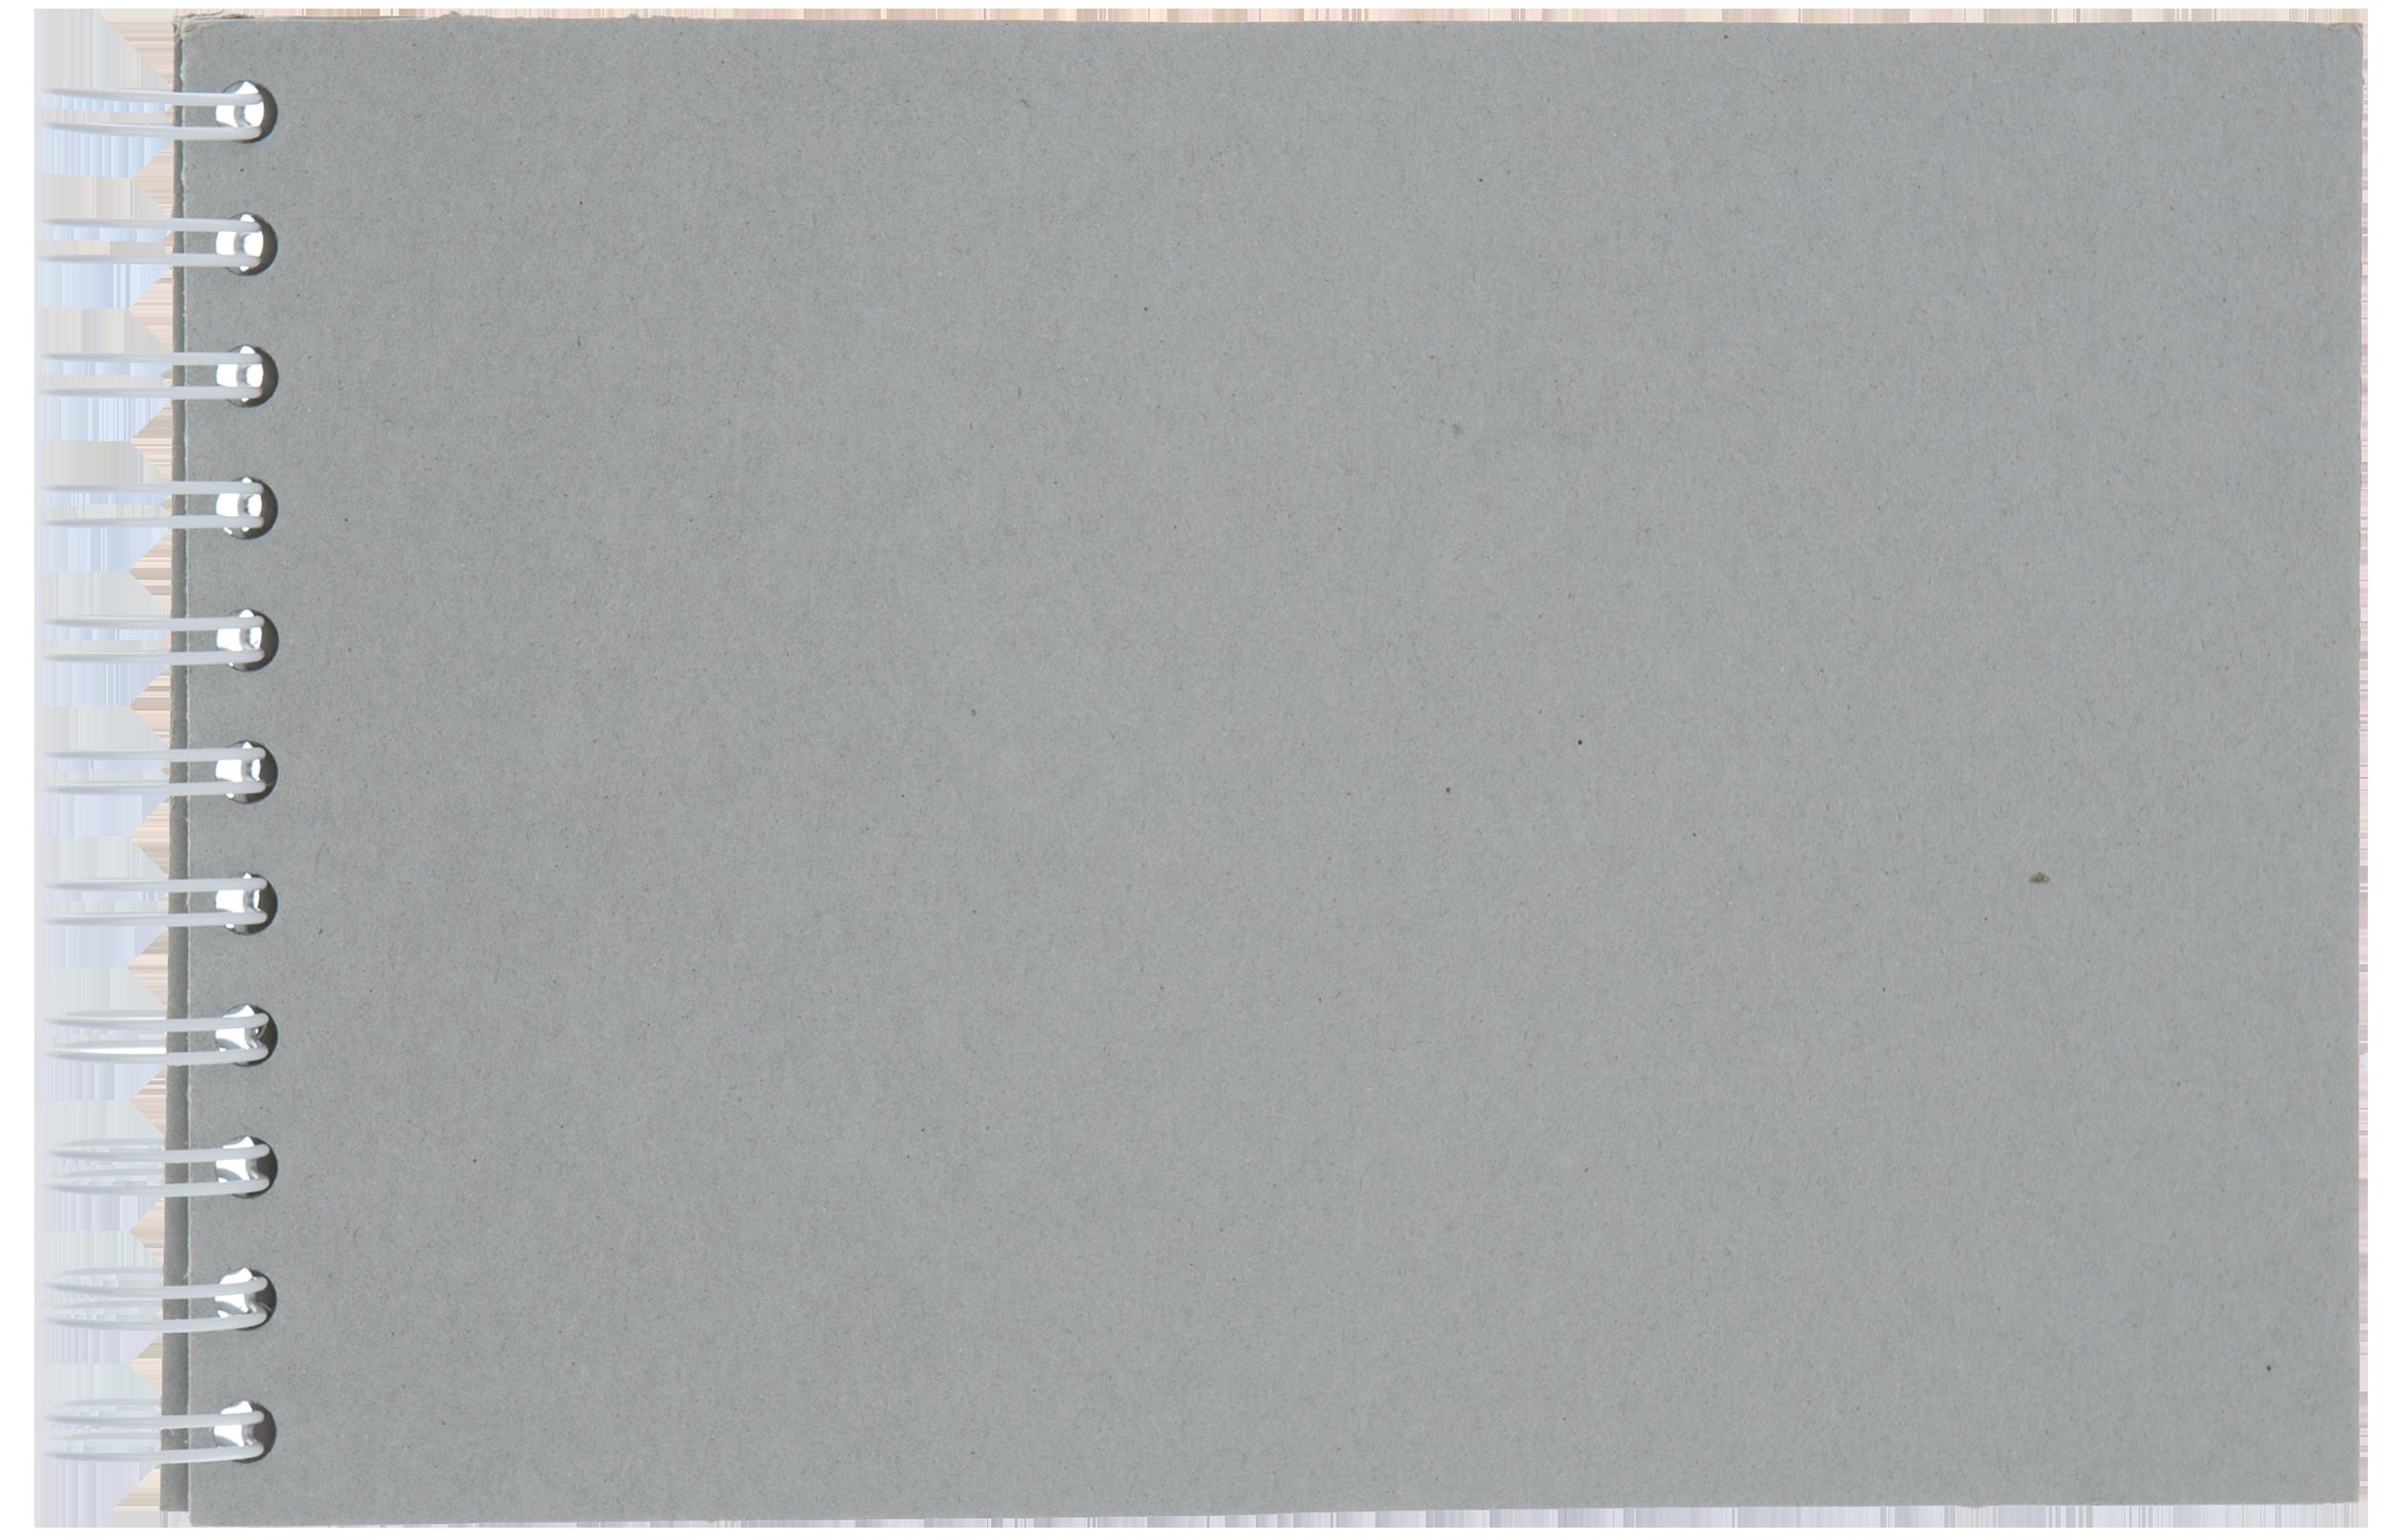 Spiralbunden kartong med tre sidor.